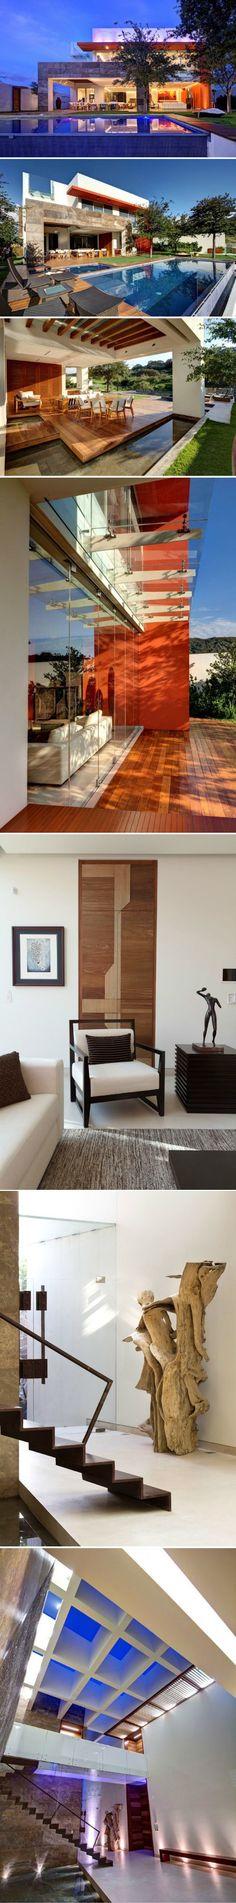 arquitectura moderna en casa Design, Home, Modern Architecture, Trendy Tree